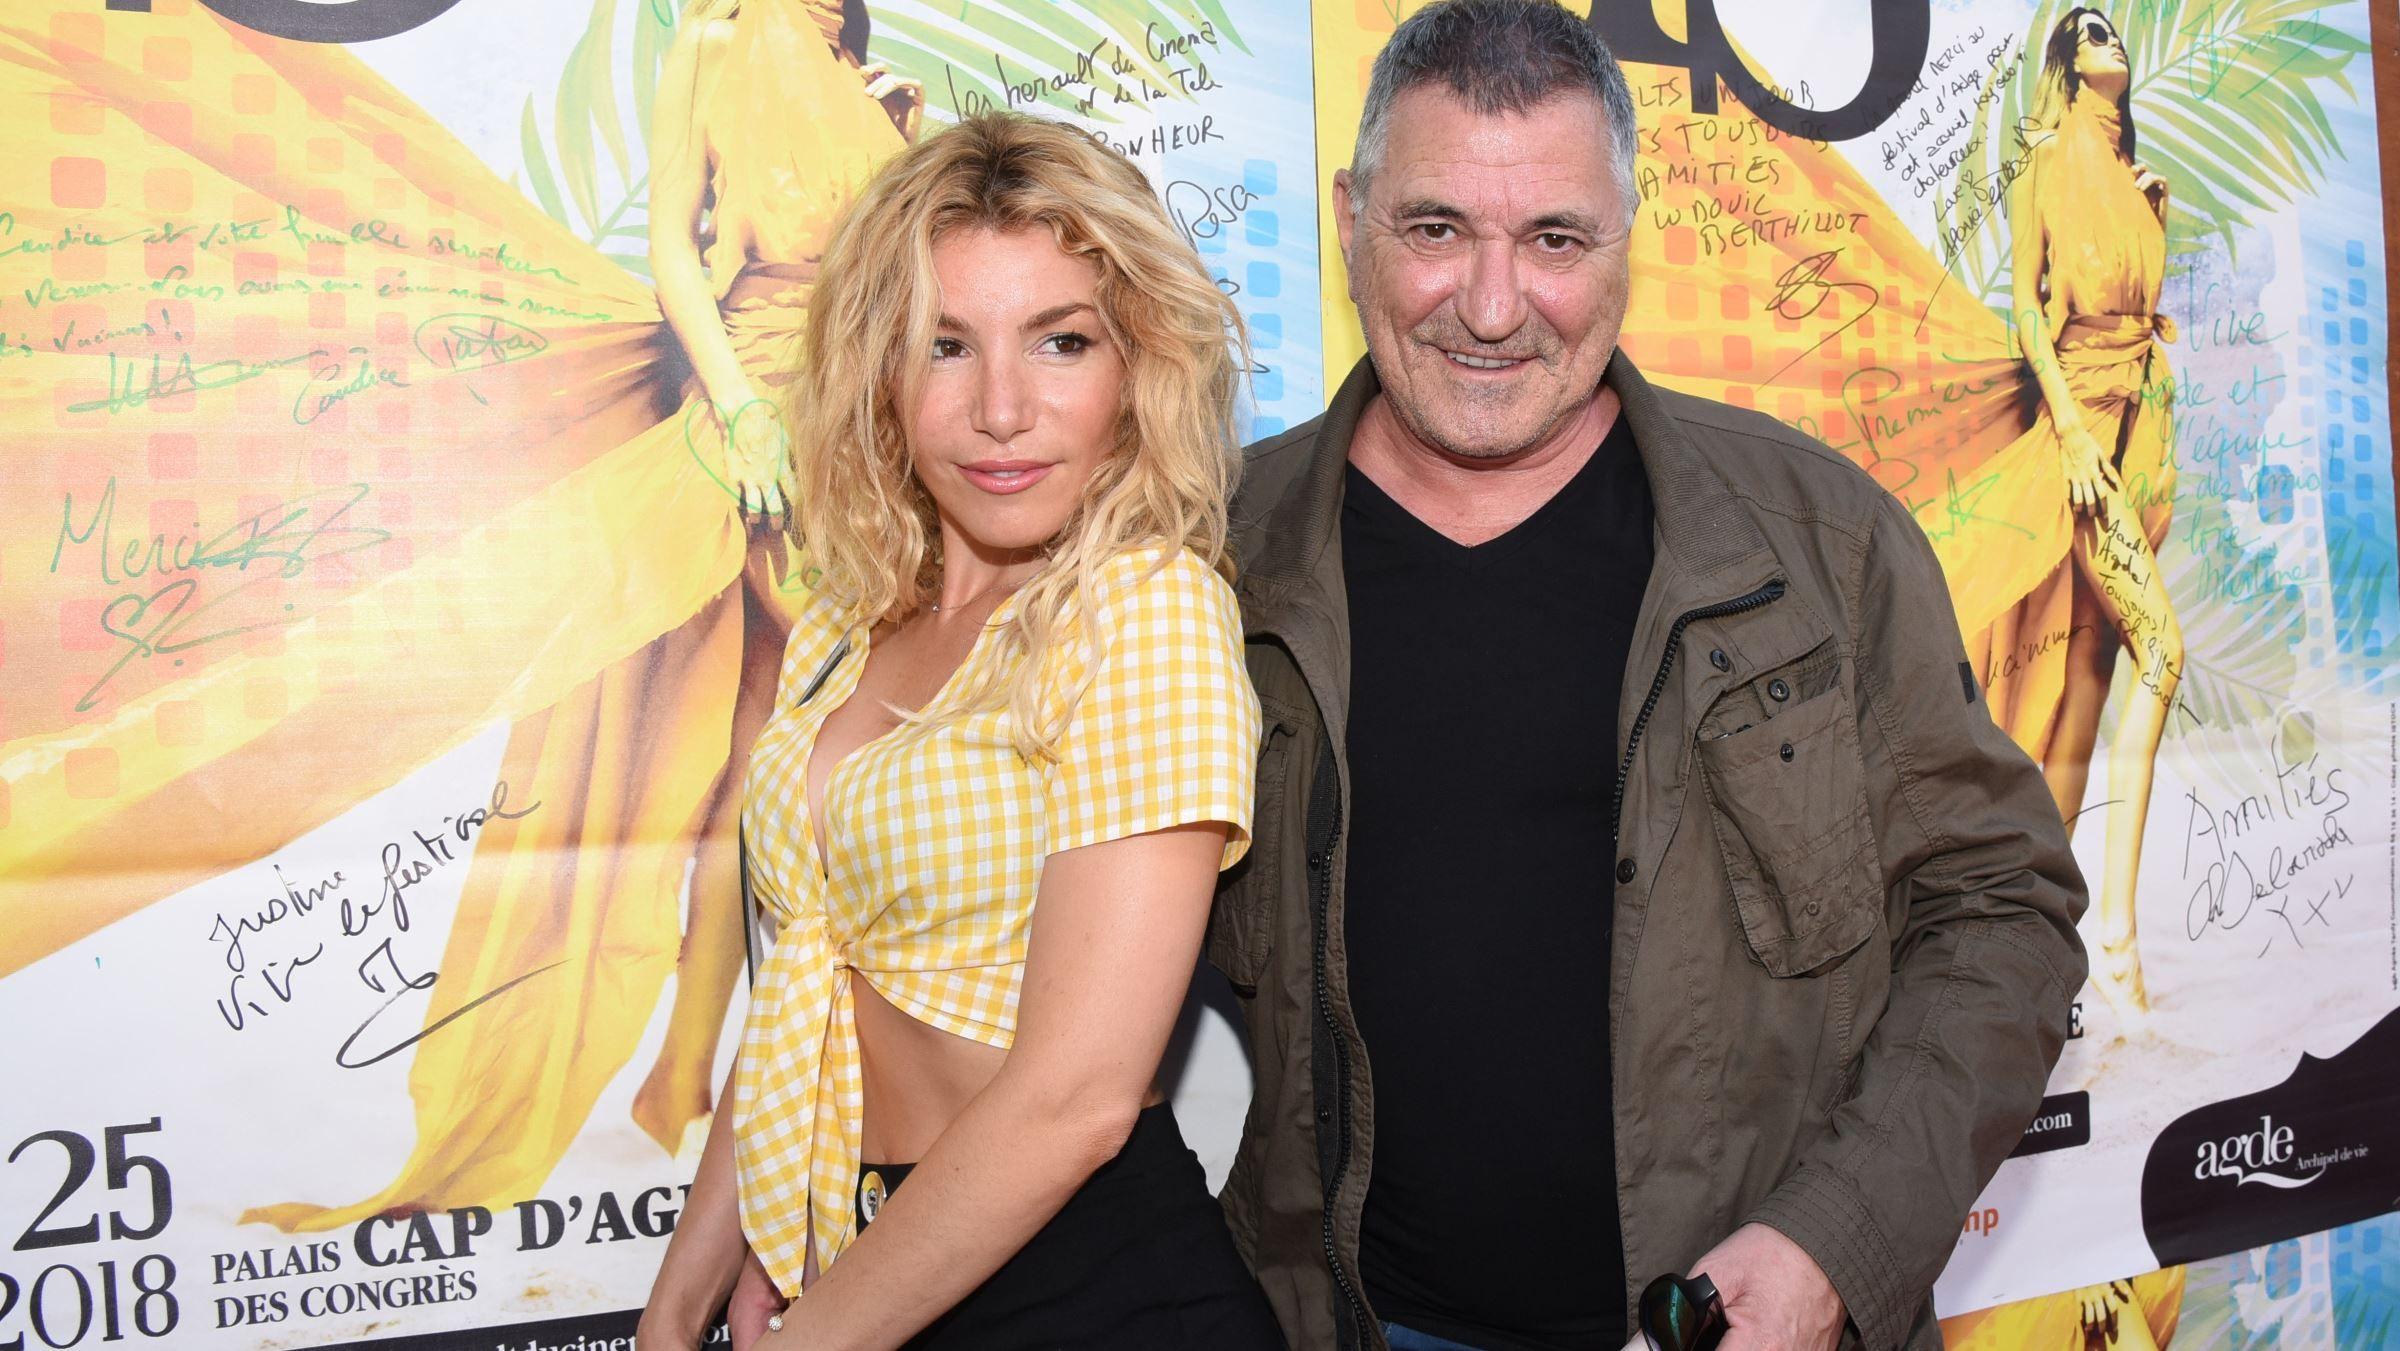 Lola Marois et Jean-Marie Bigard